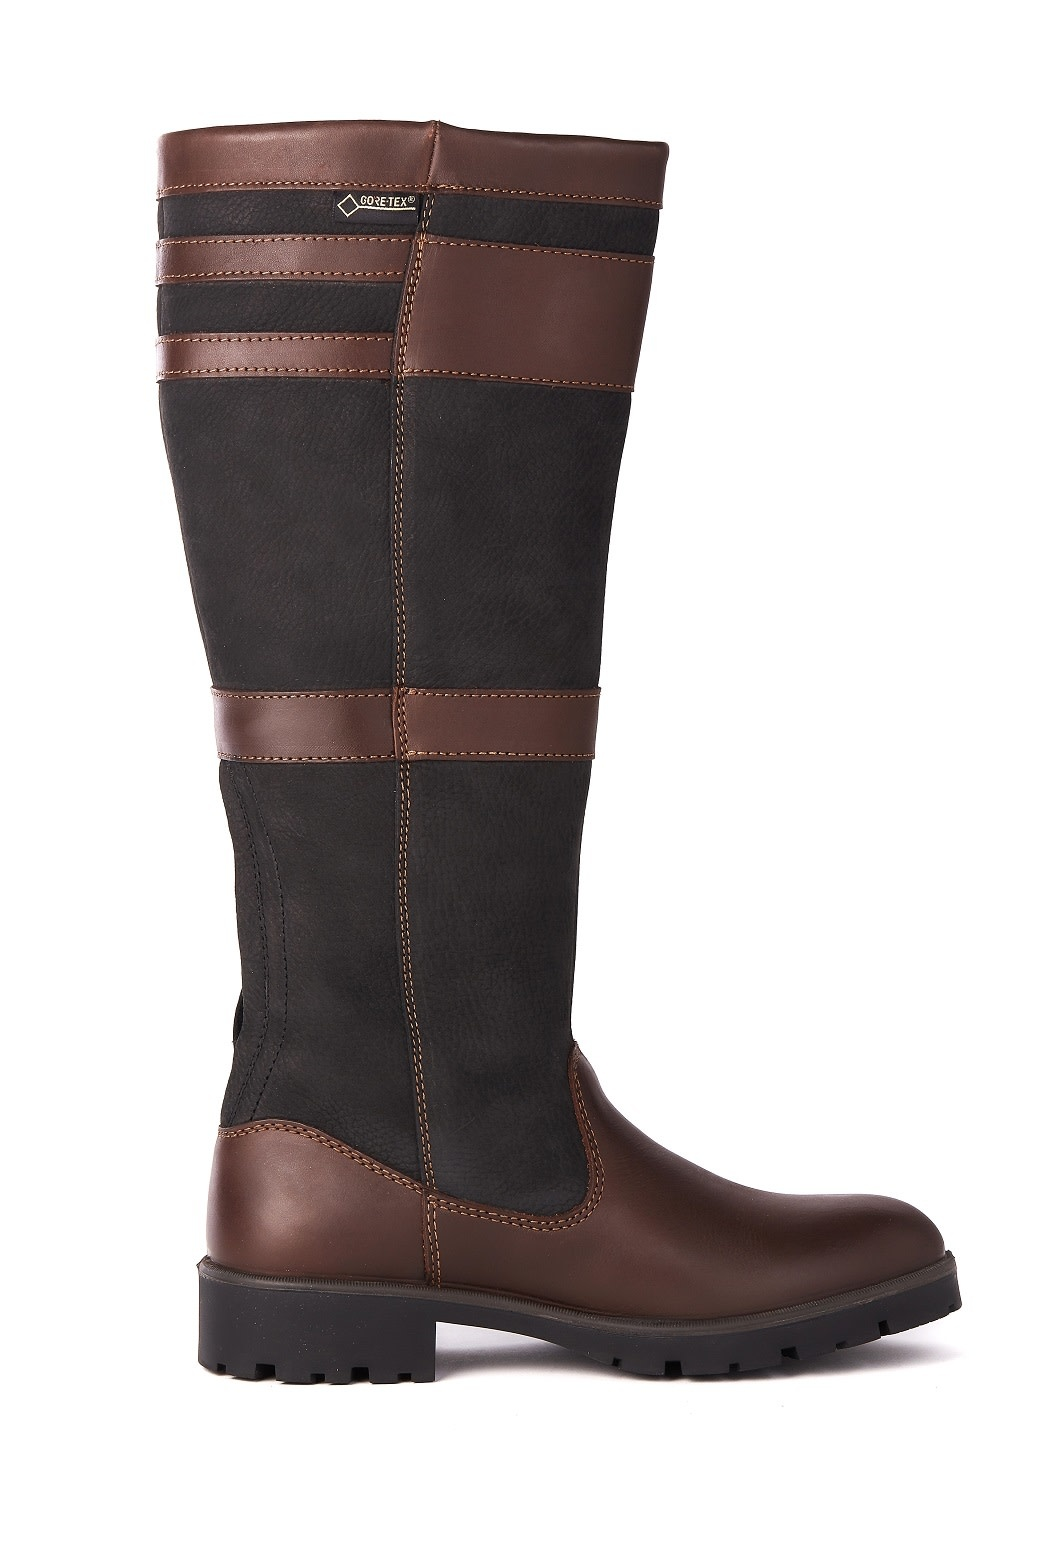 Dubarry Longford - Black/Brown-4